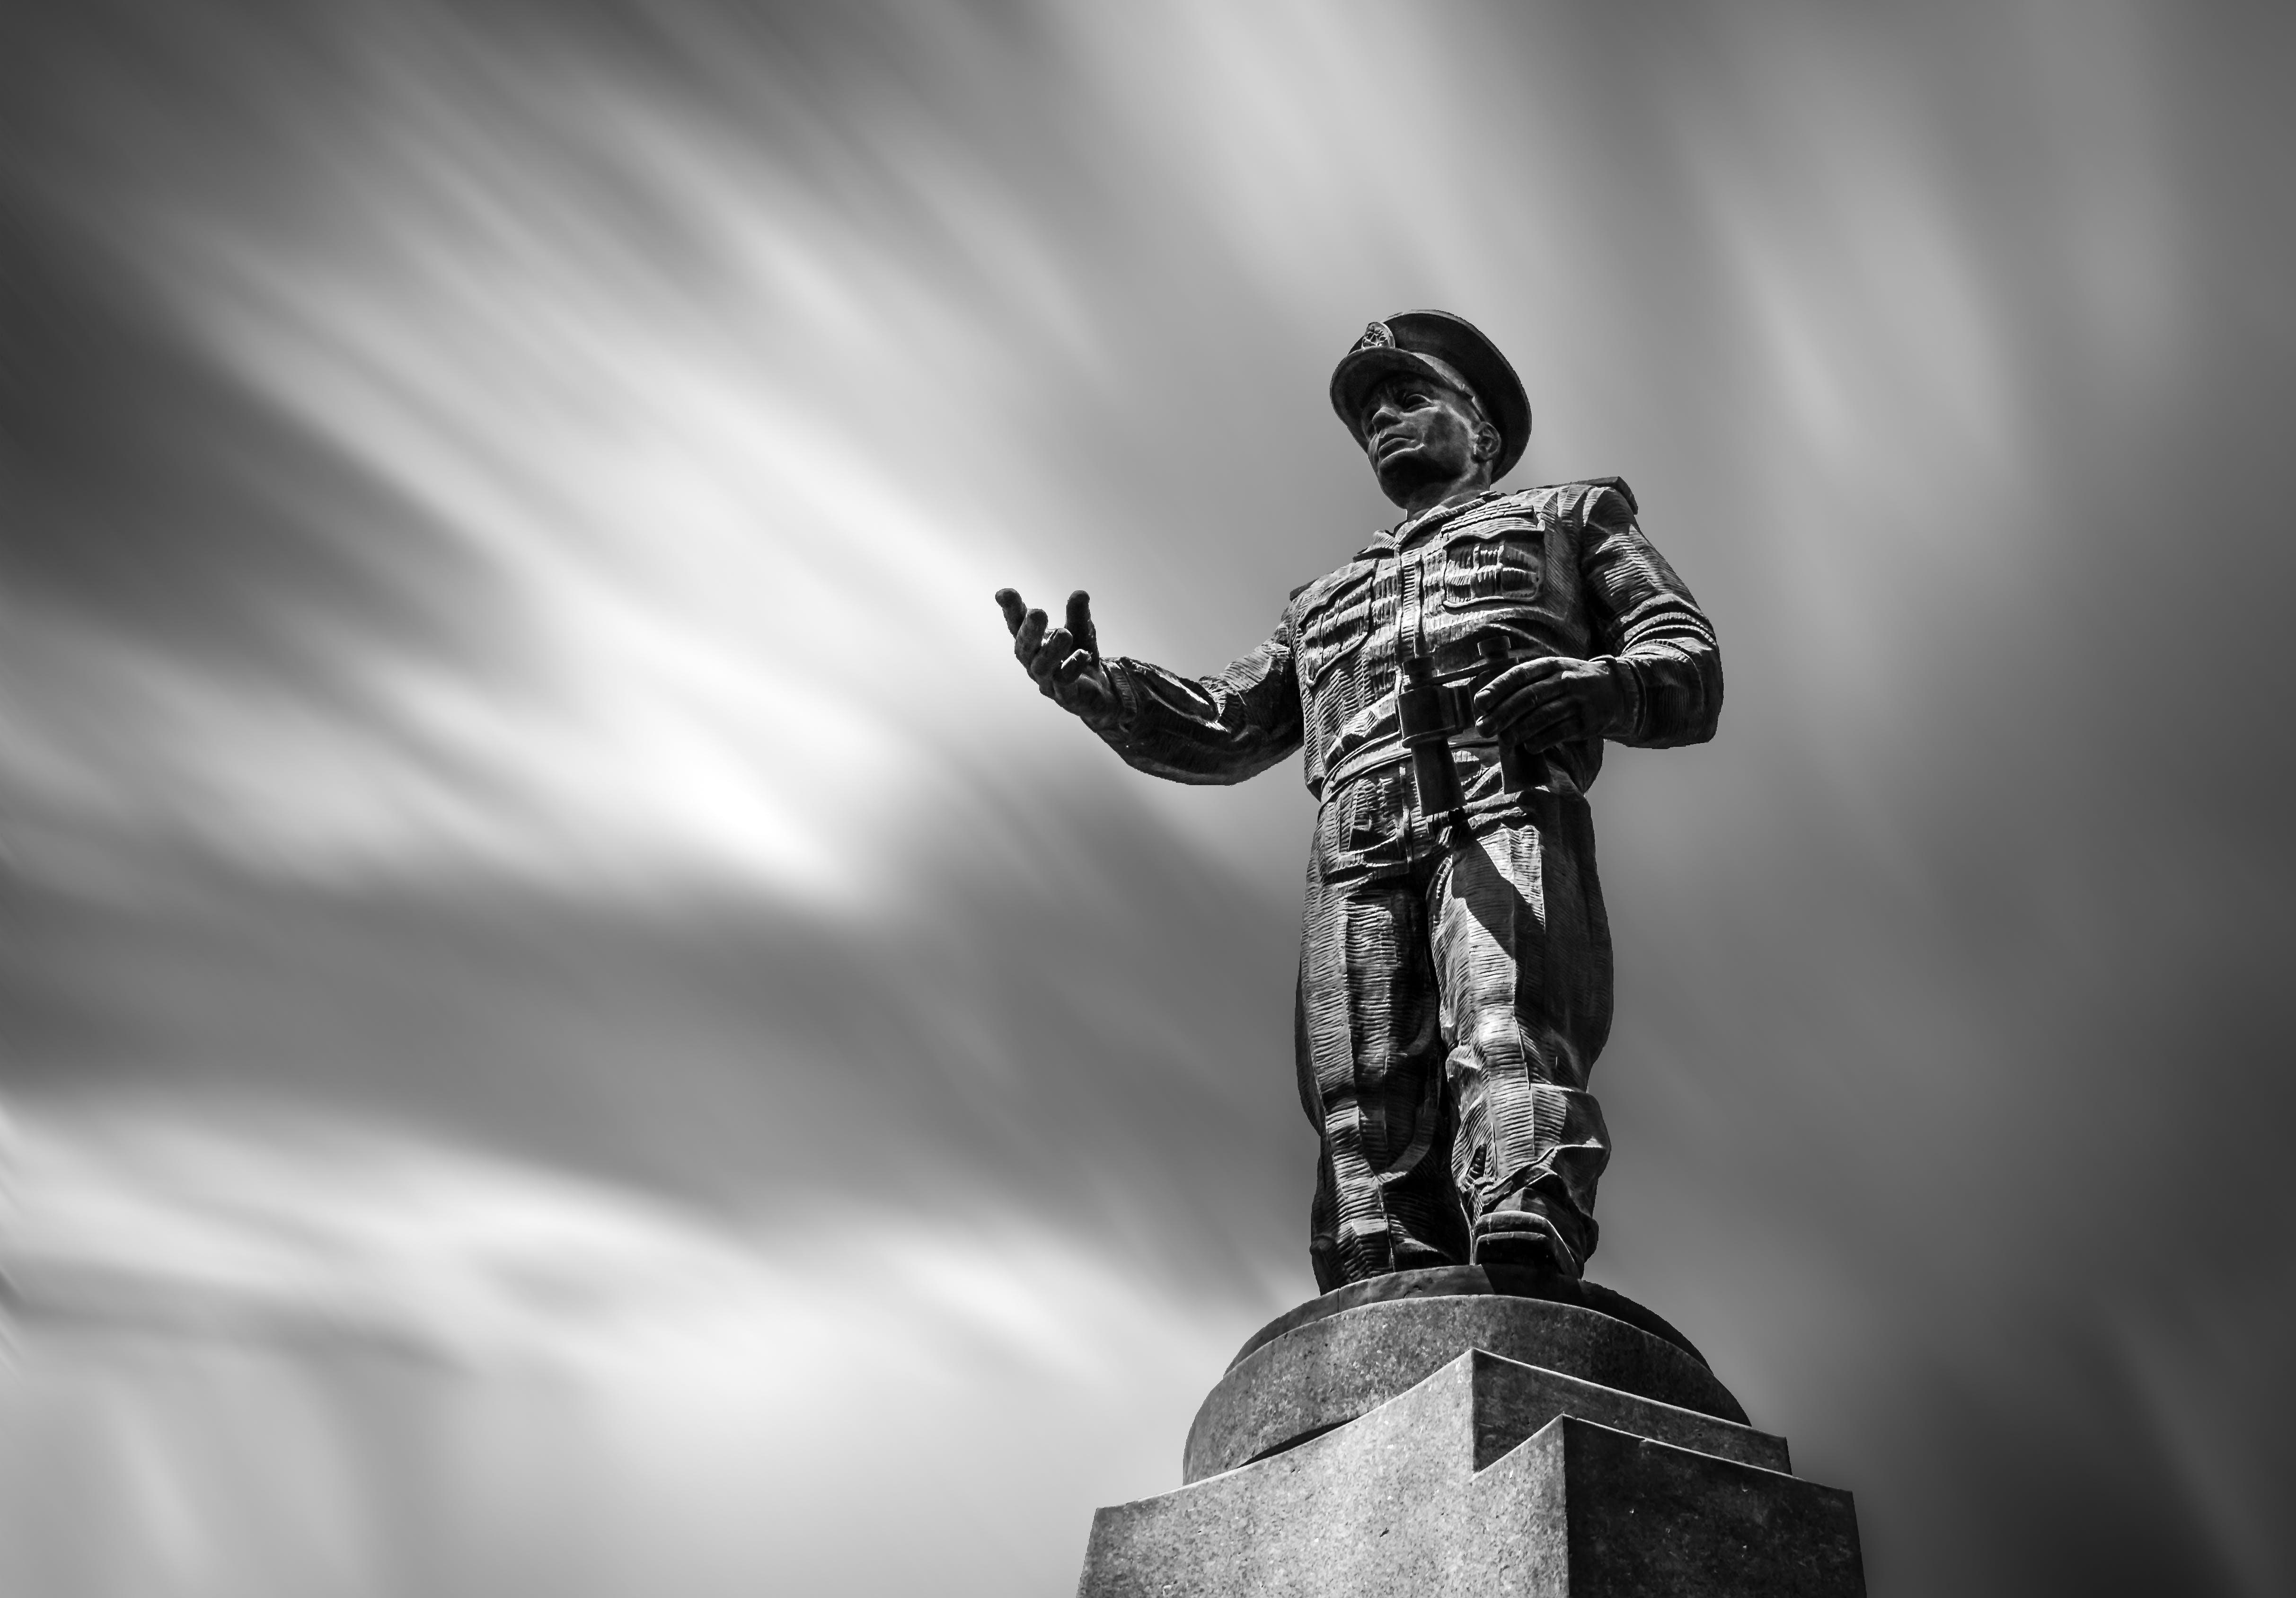 art, black and white, blurred background